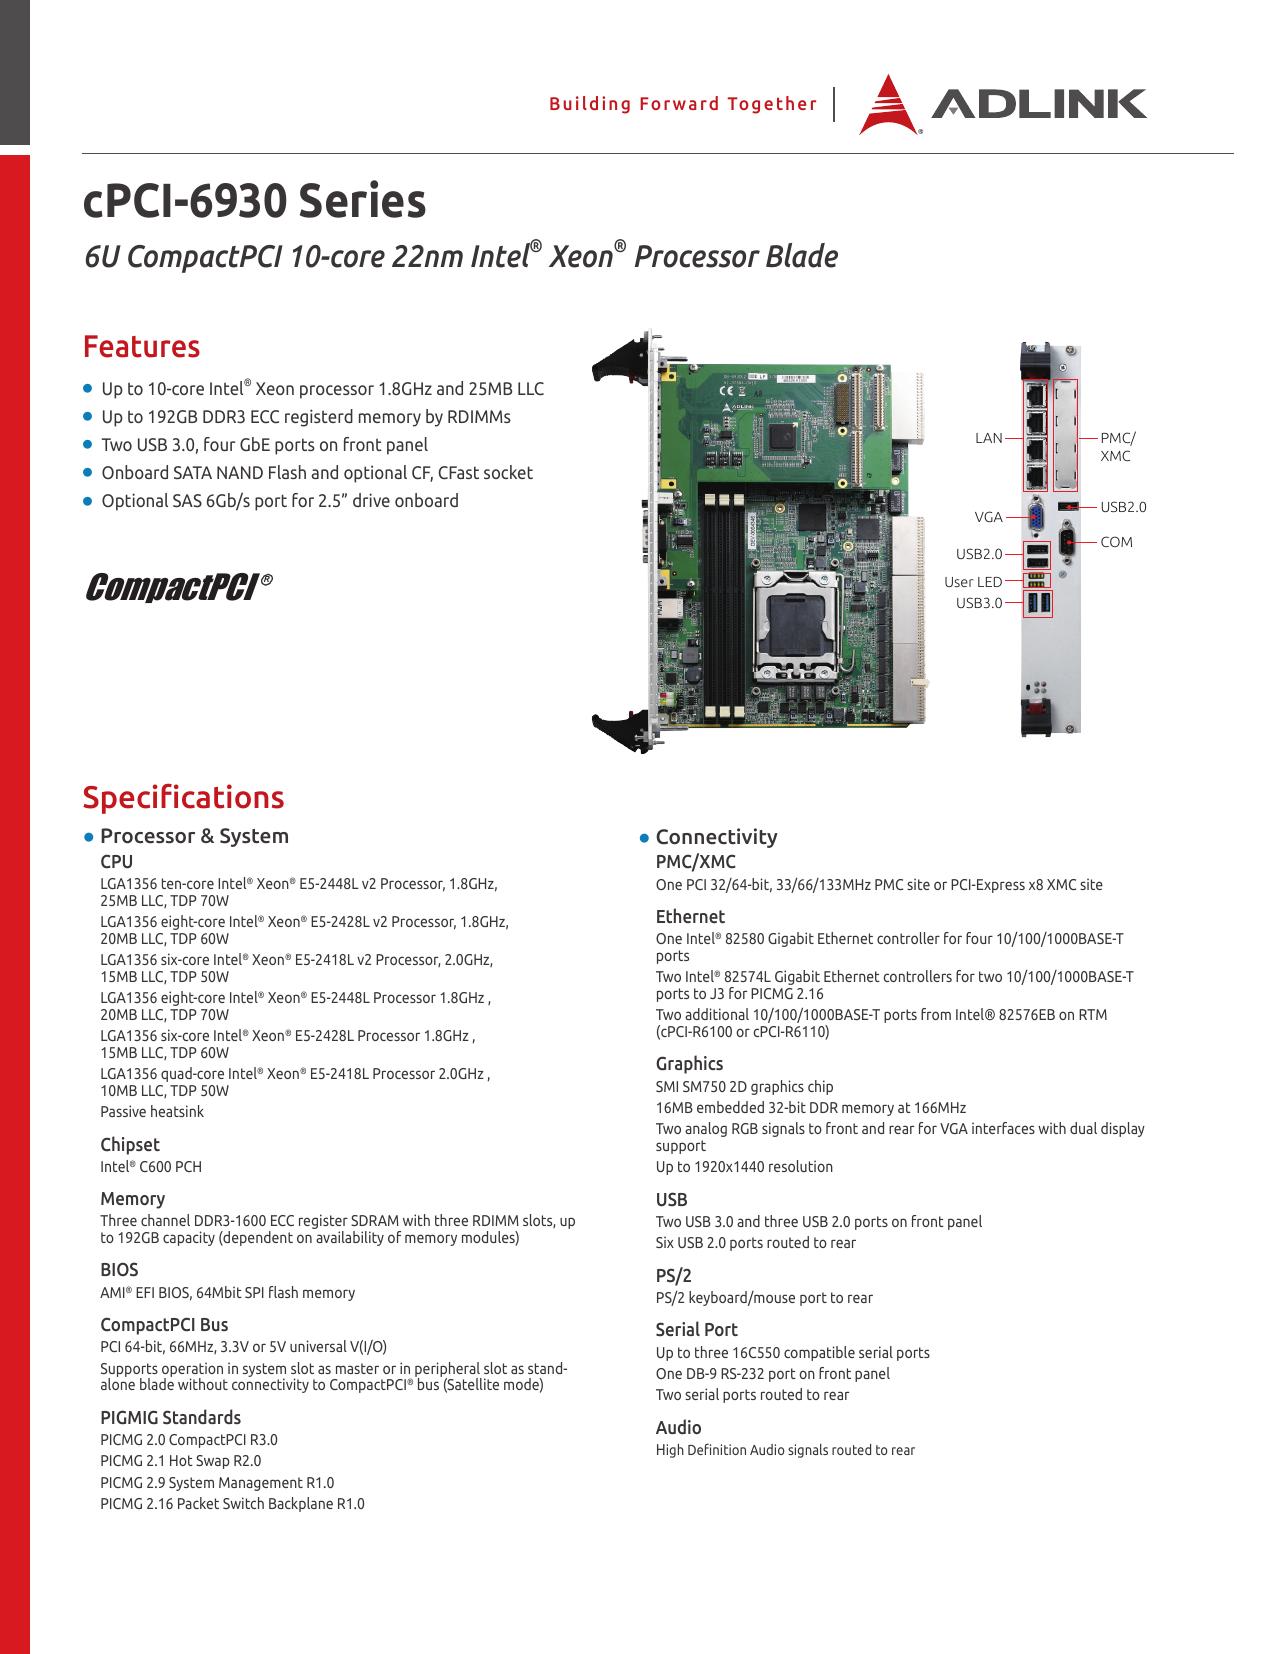 ADLINK BIOS CPCI-6765 DRIVERS DOWNLOAD